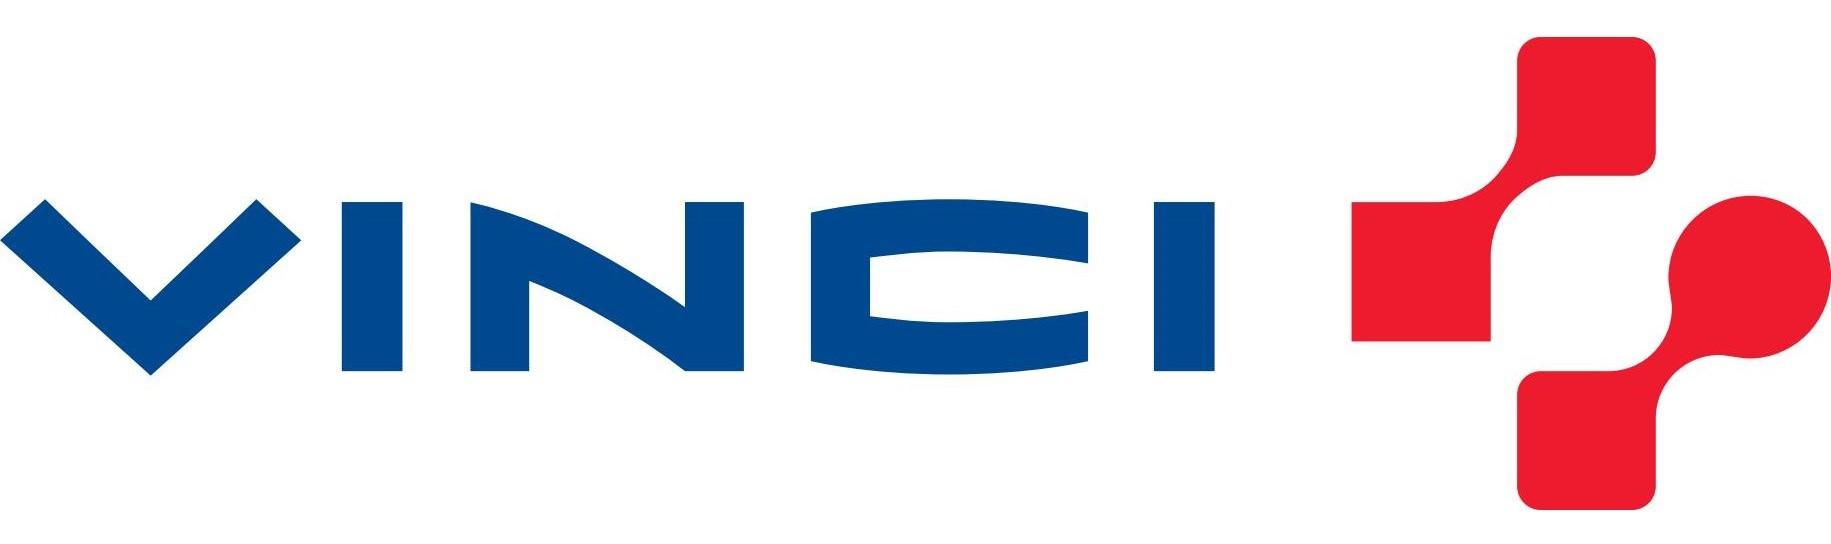 vinci-construction-logo.jpg